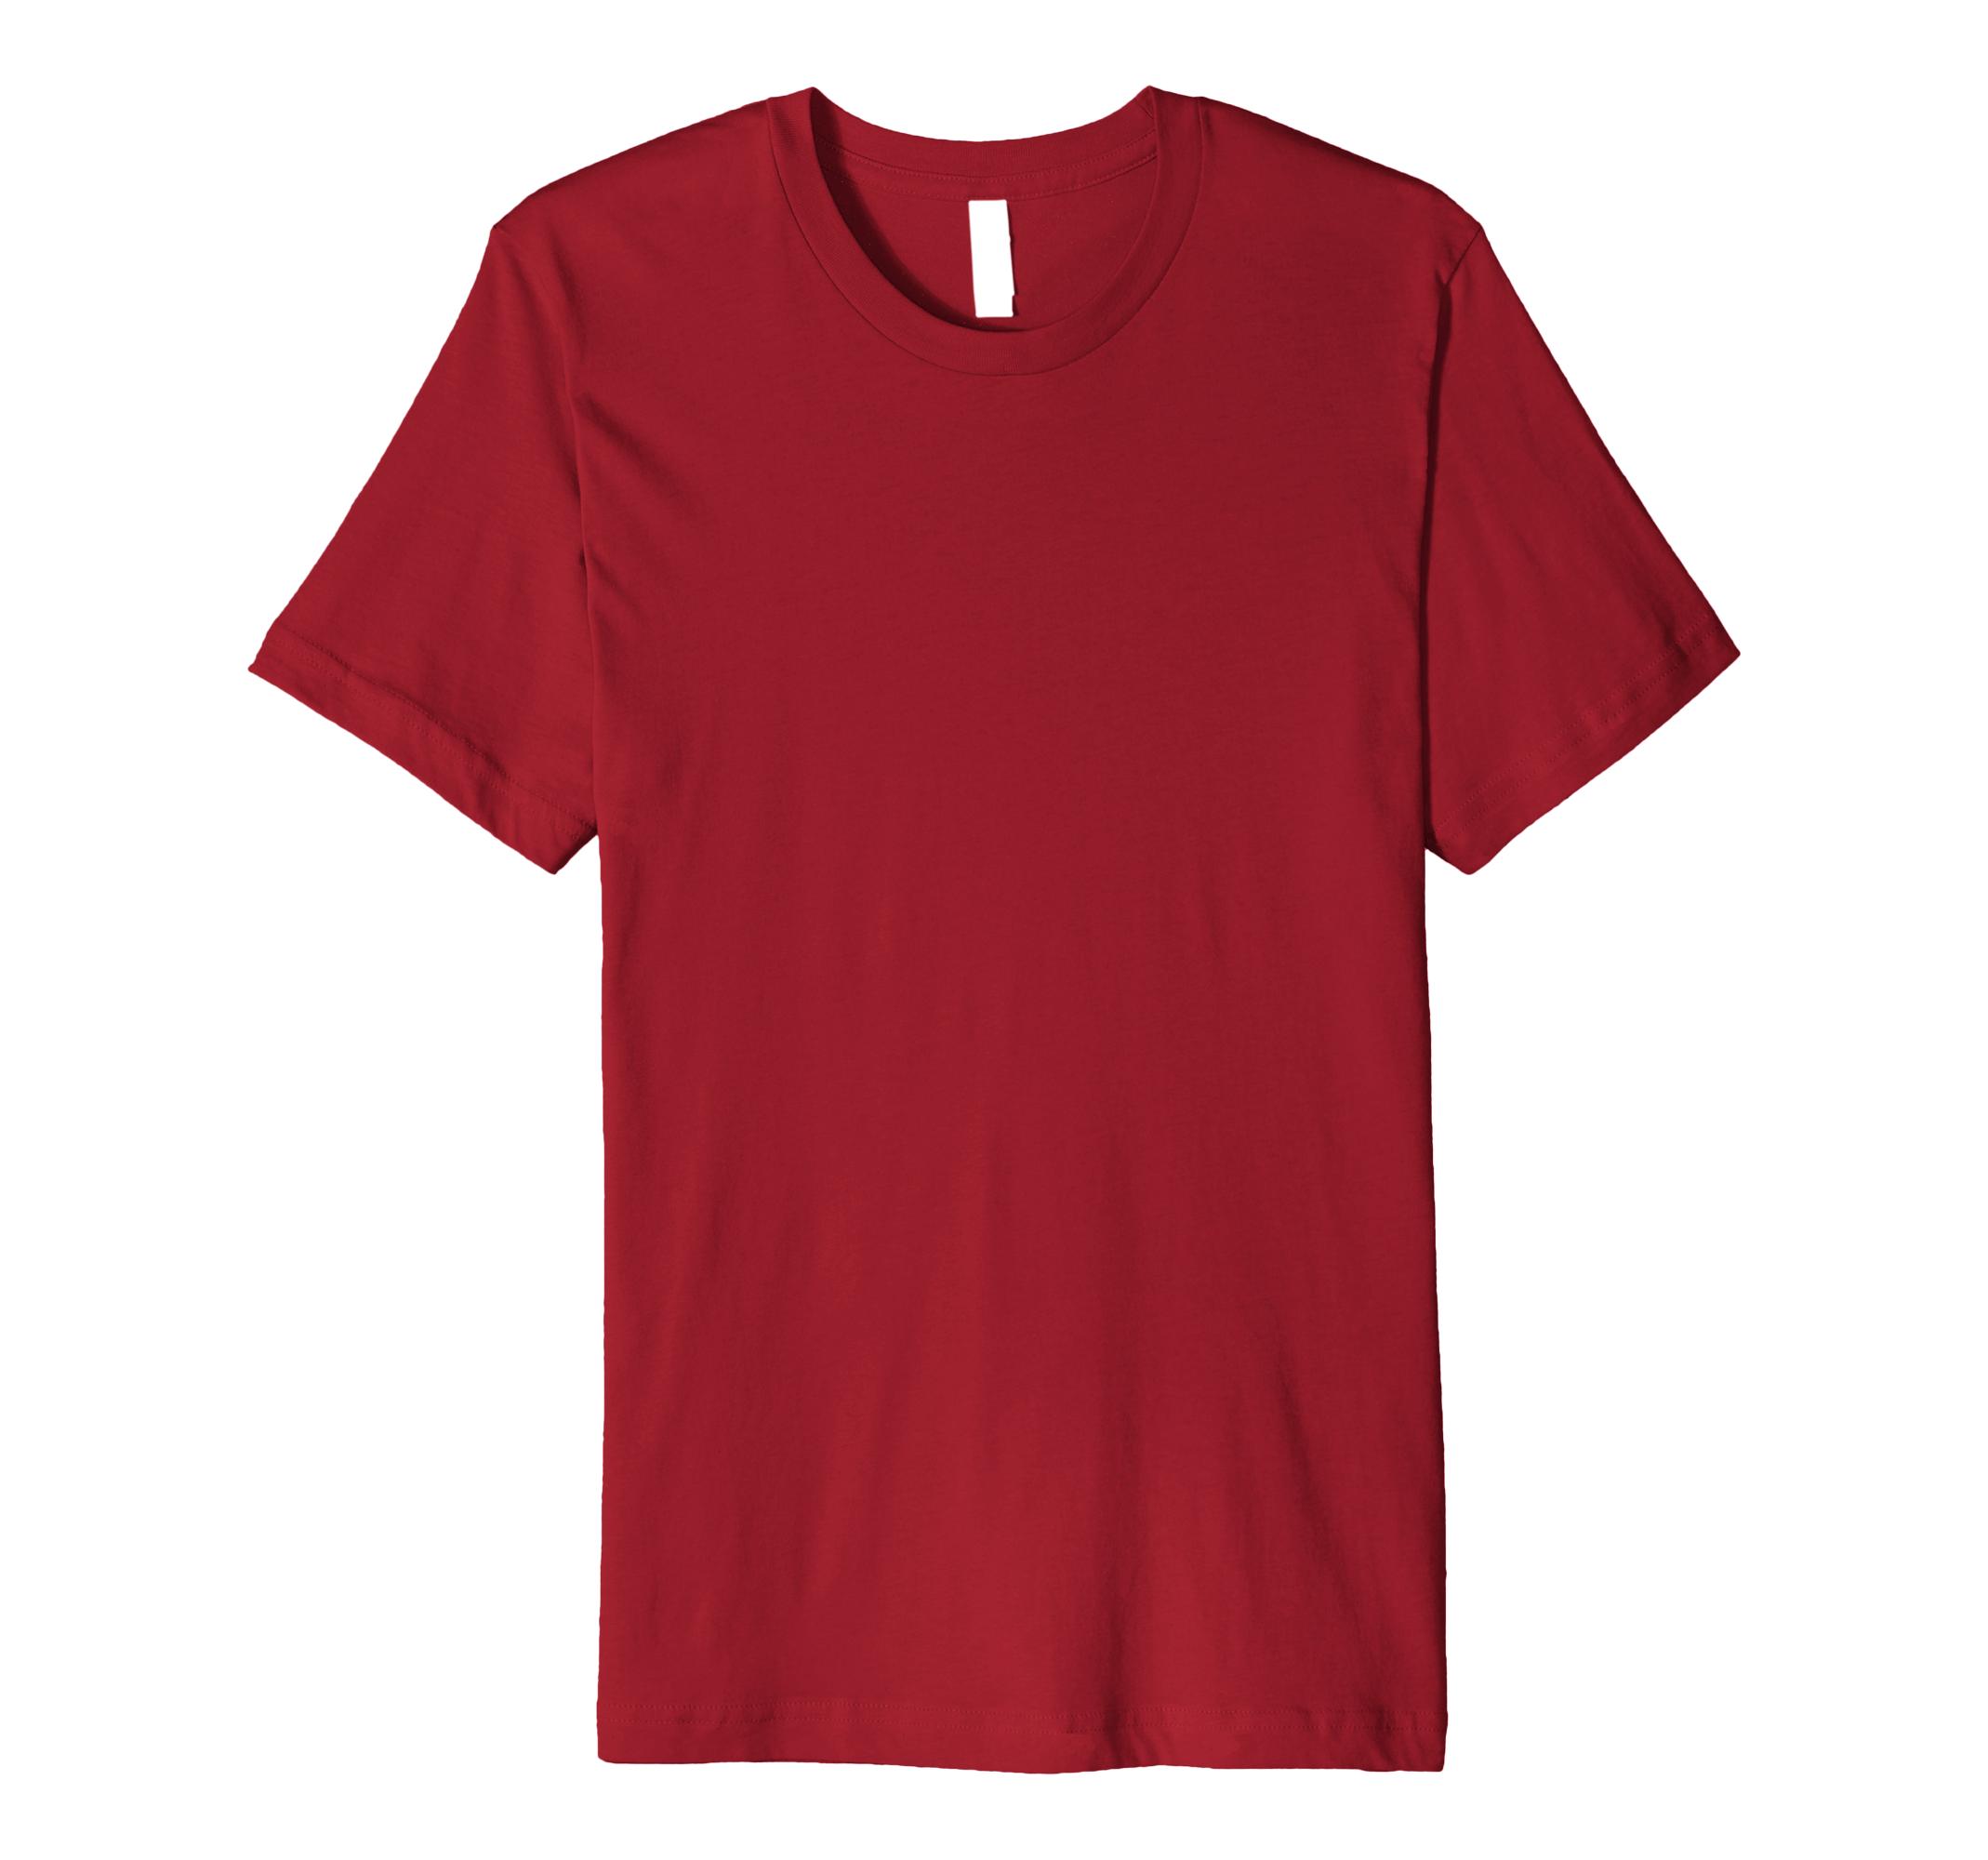 Delta Sorority Natural Hair Woman Sigma Theta Paraphernal t shirt